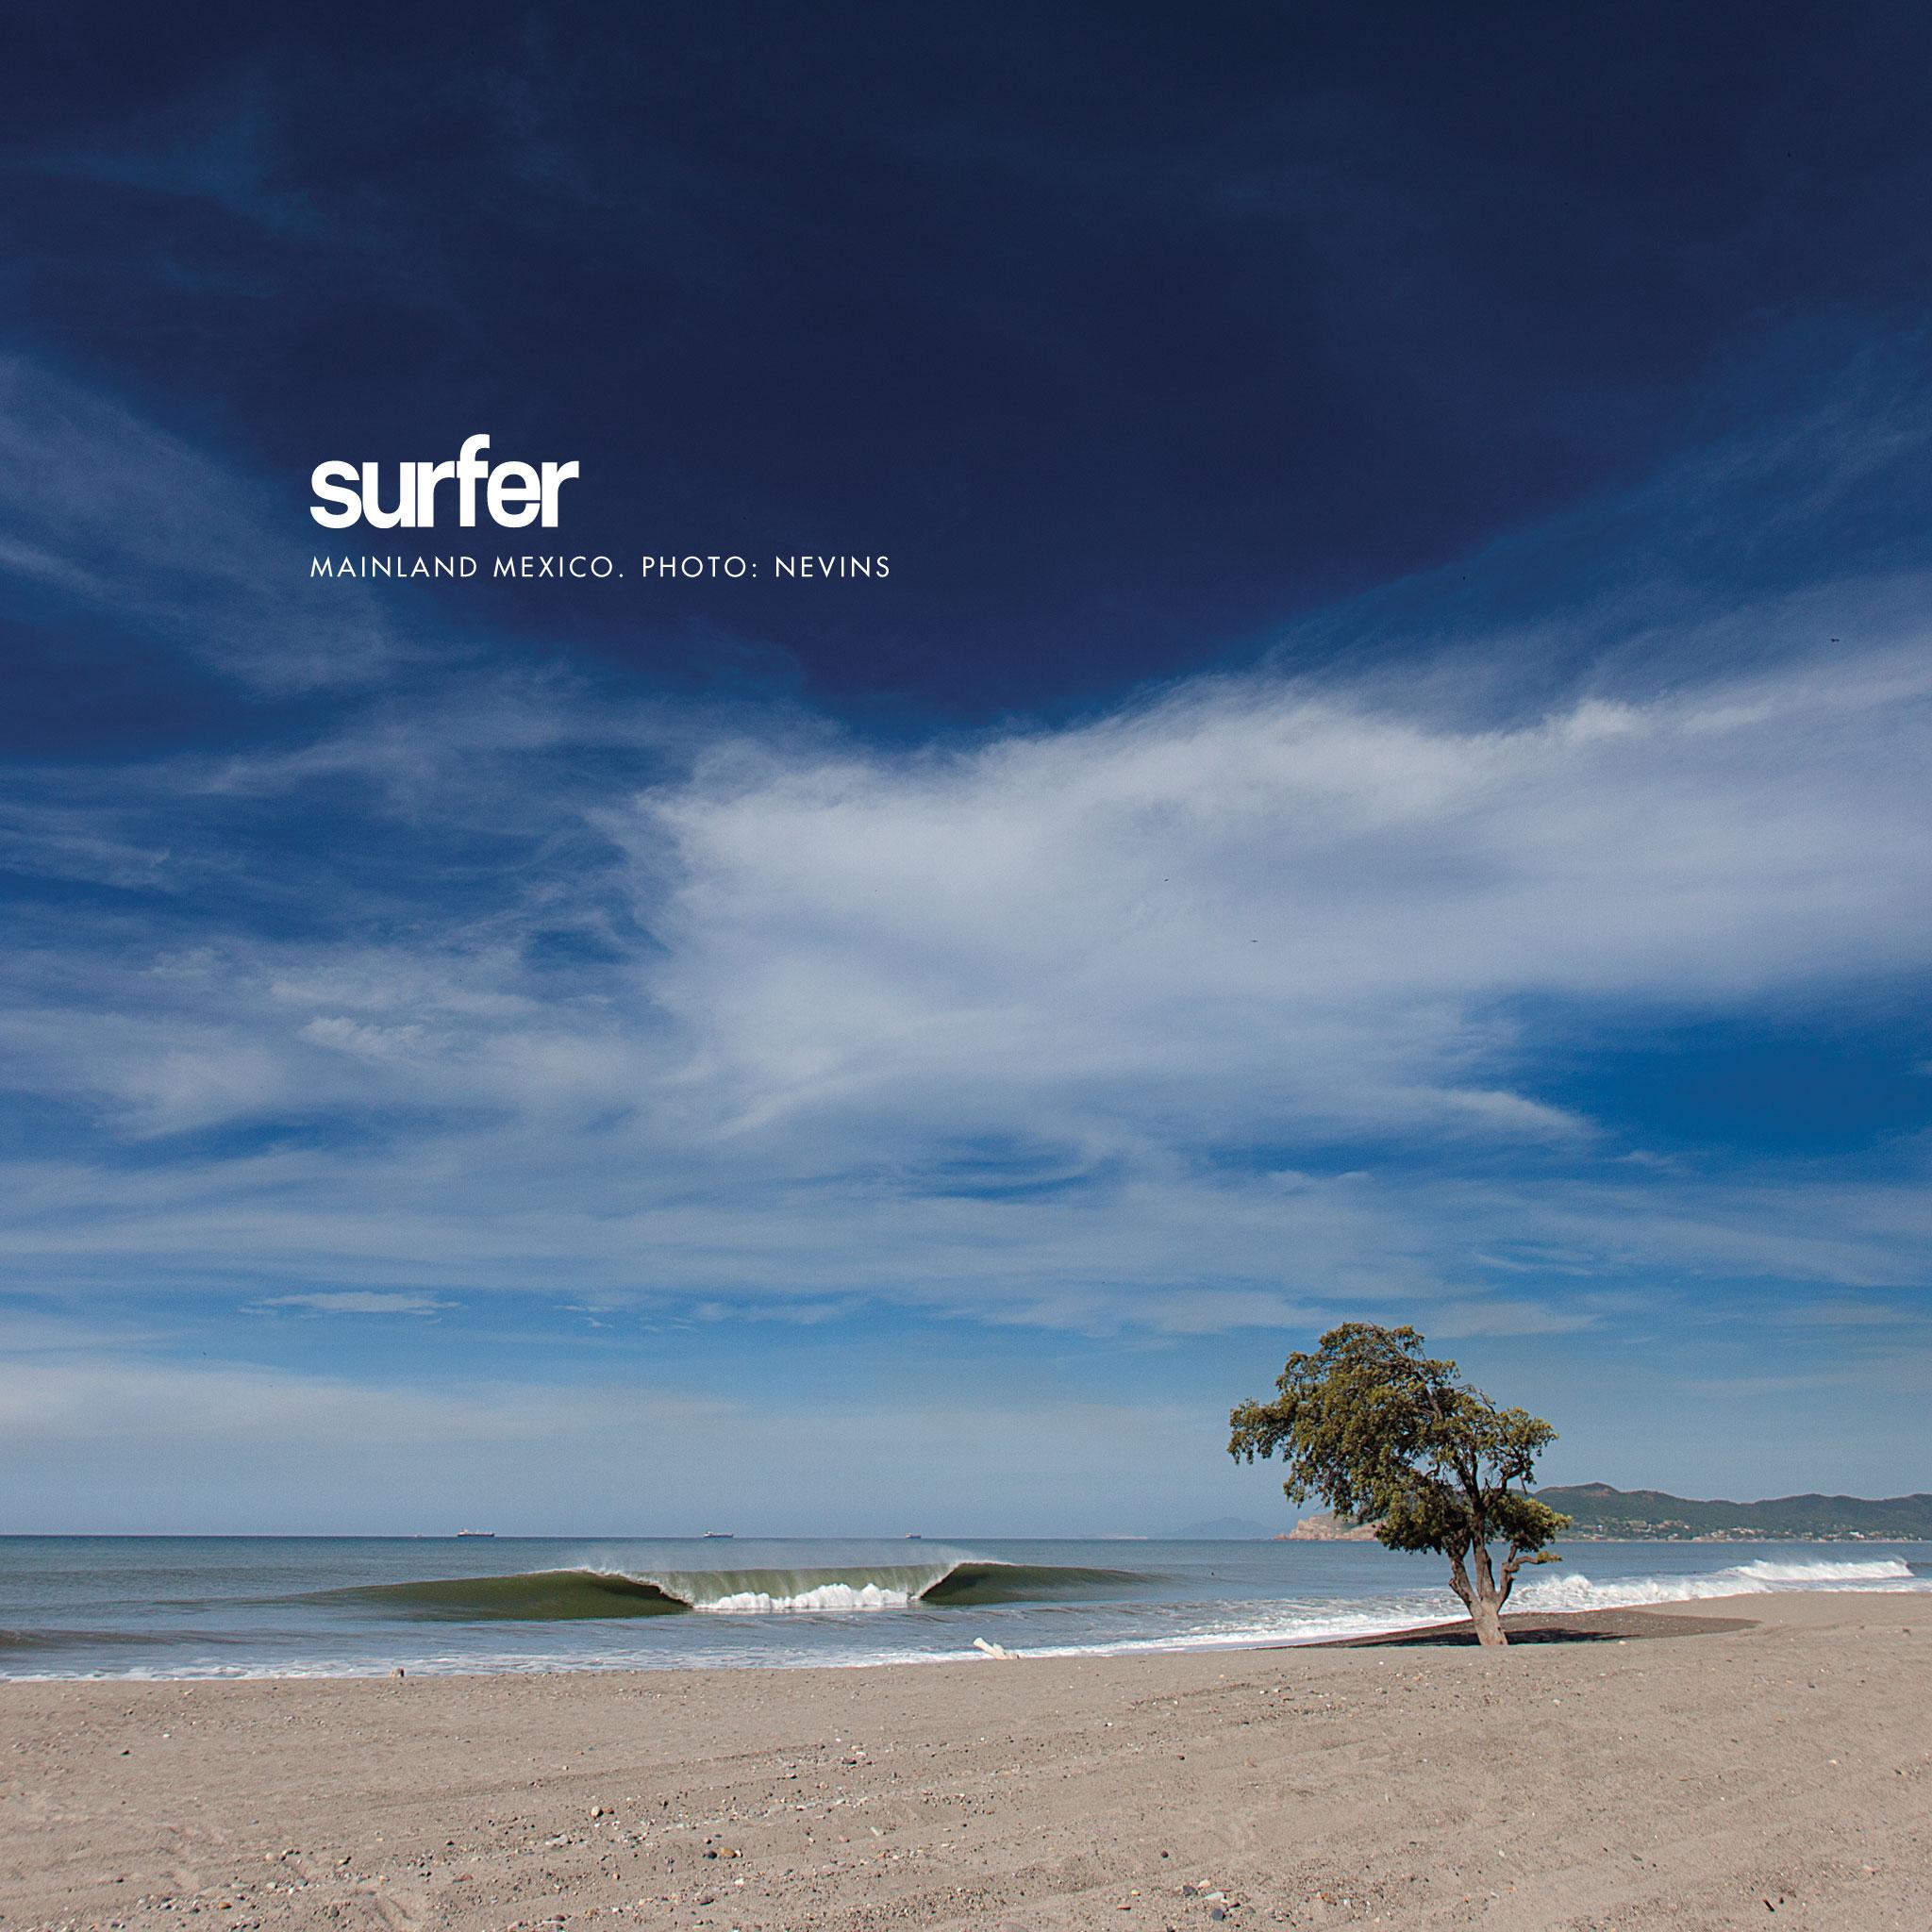 SURFER Magazine Wallpapers iPad Wallpaper Gallery 2048x2048